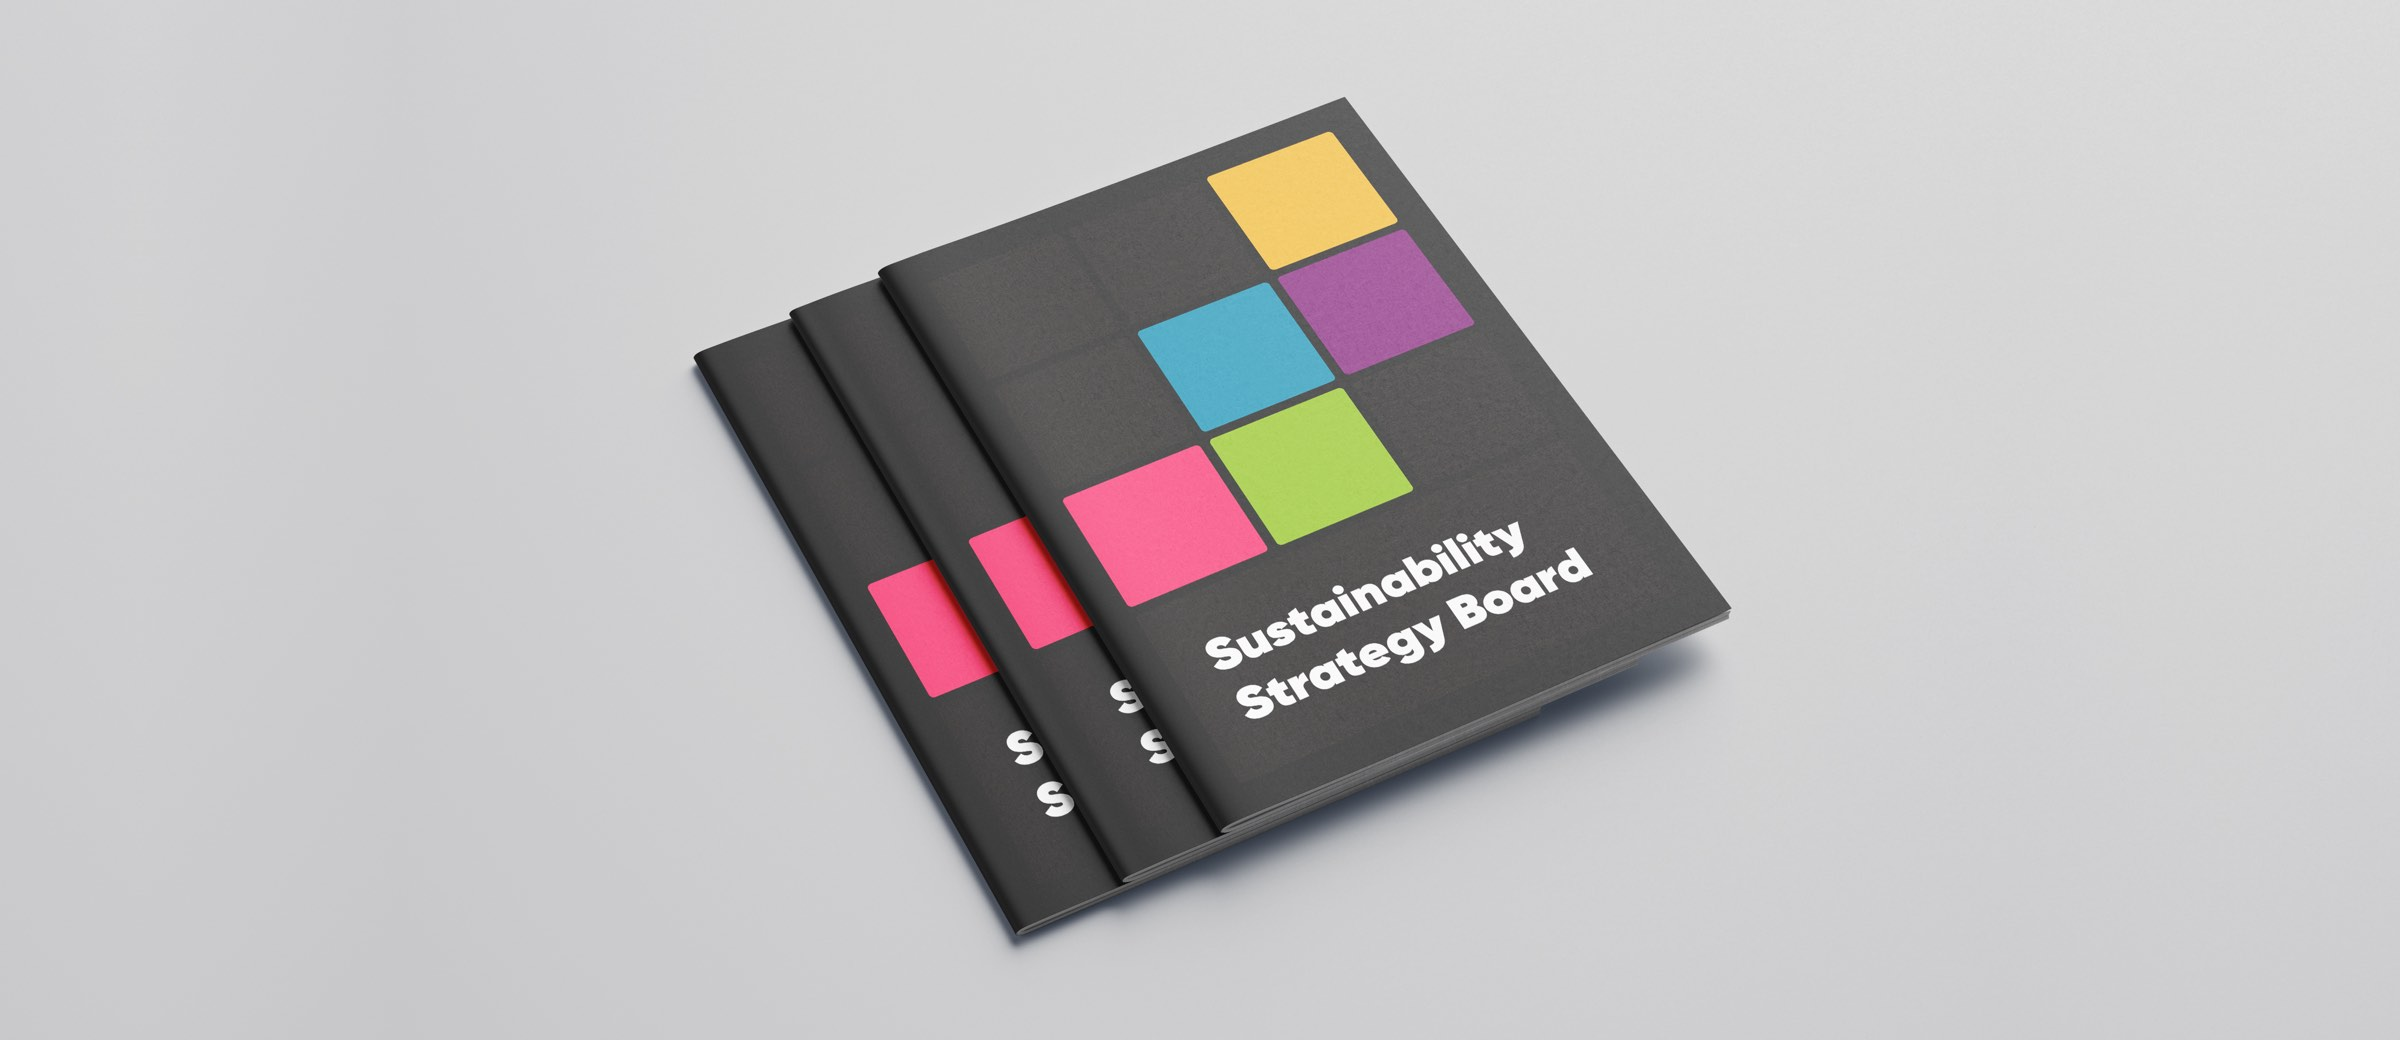 Sustainability Strategy Board Instructions Mockup